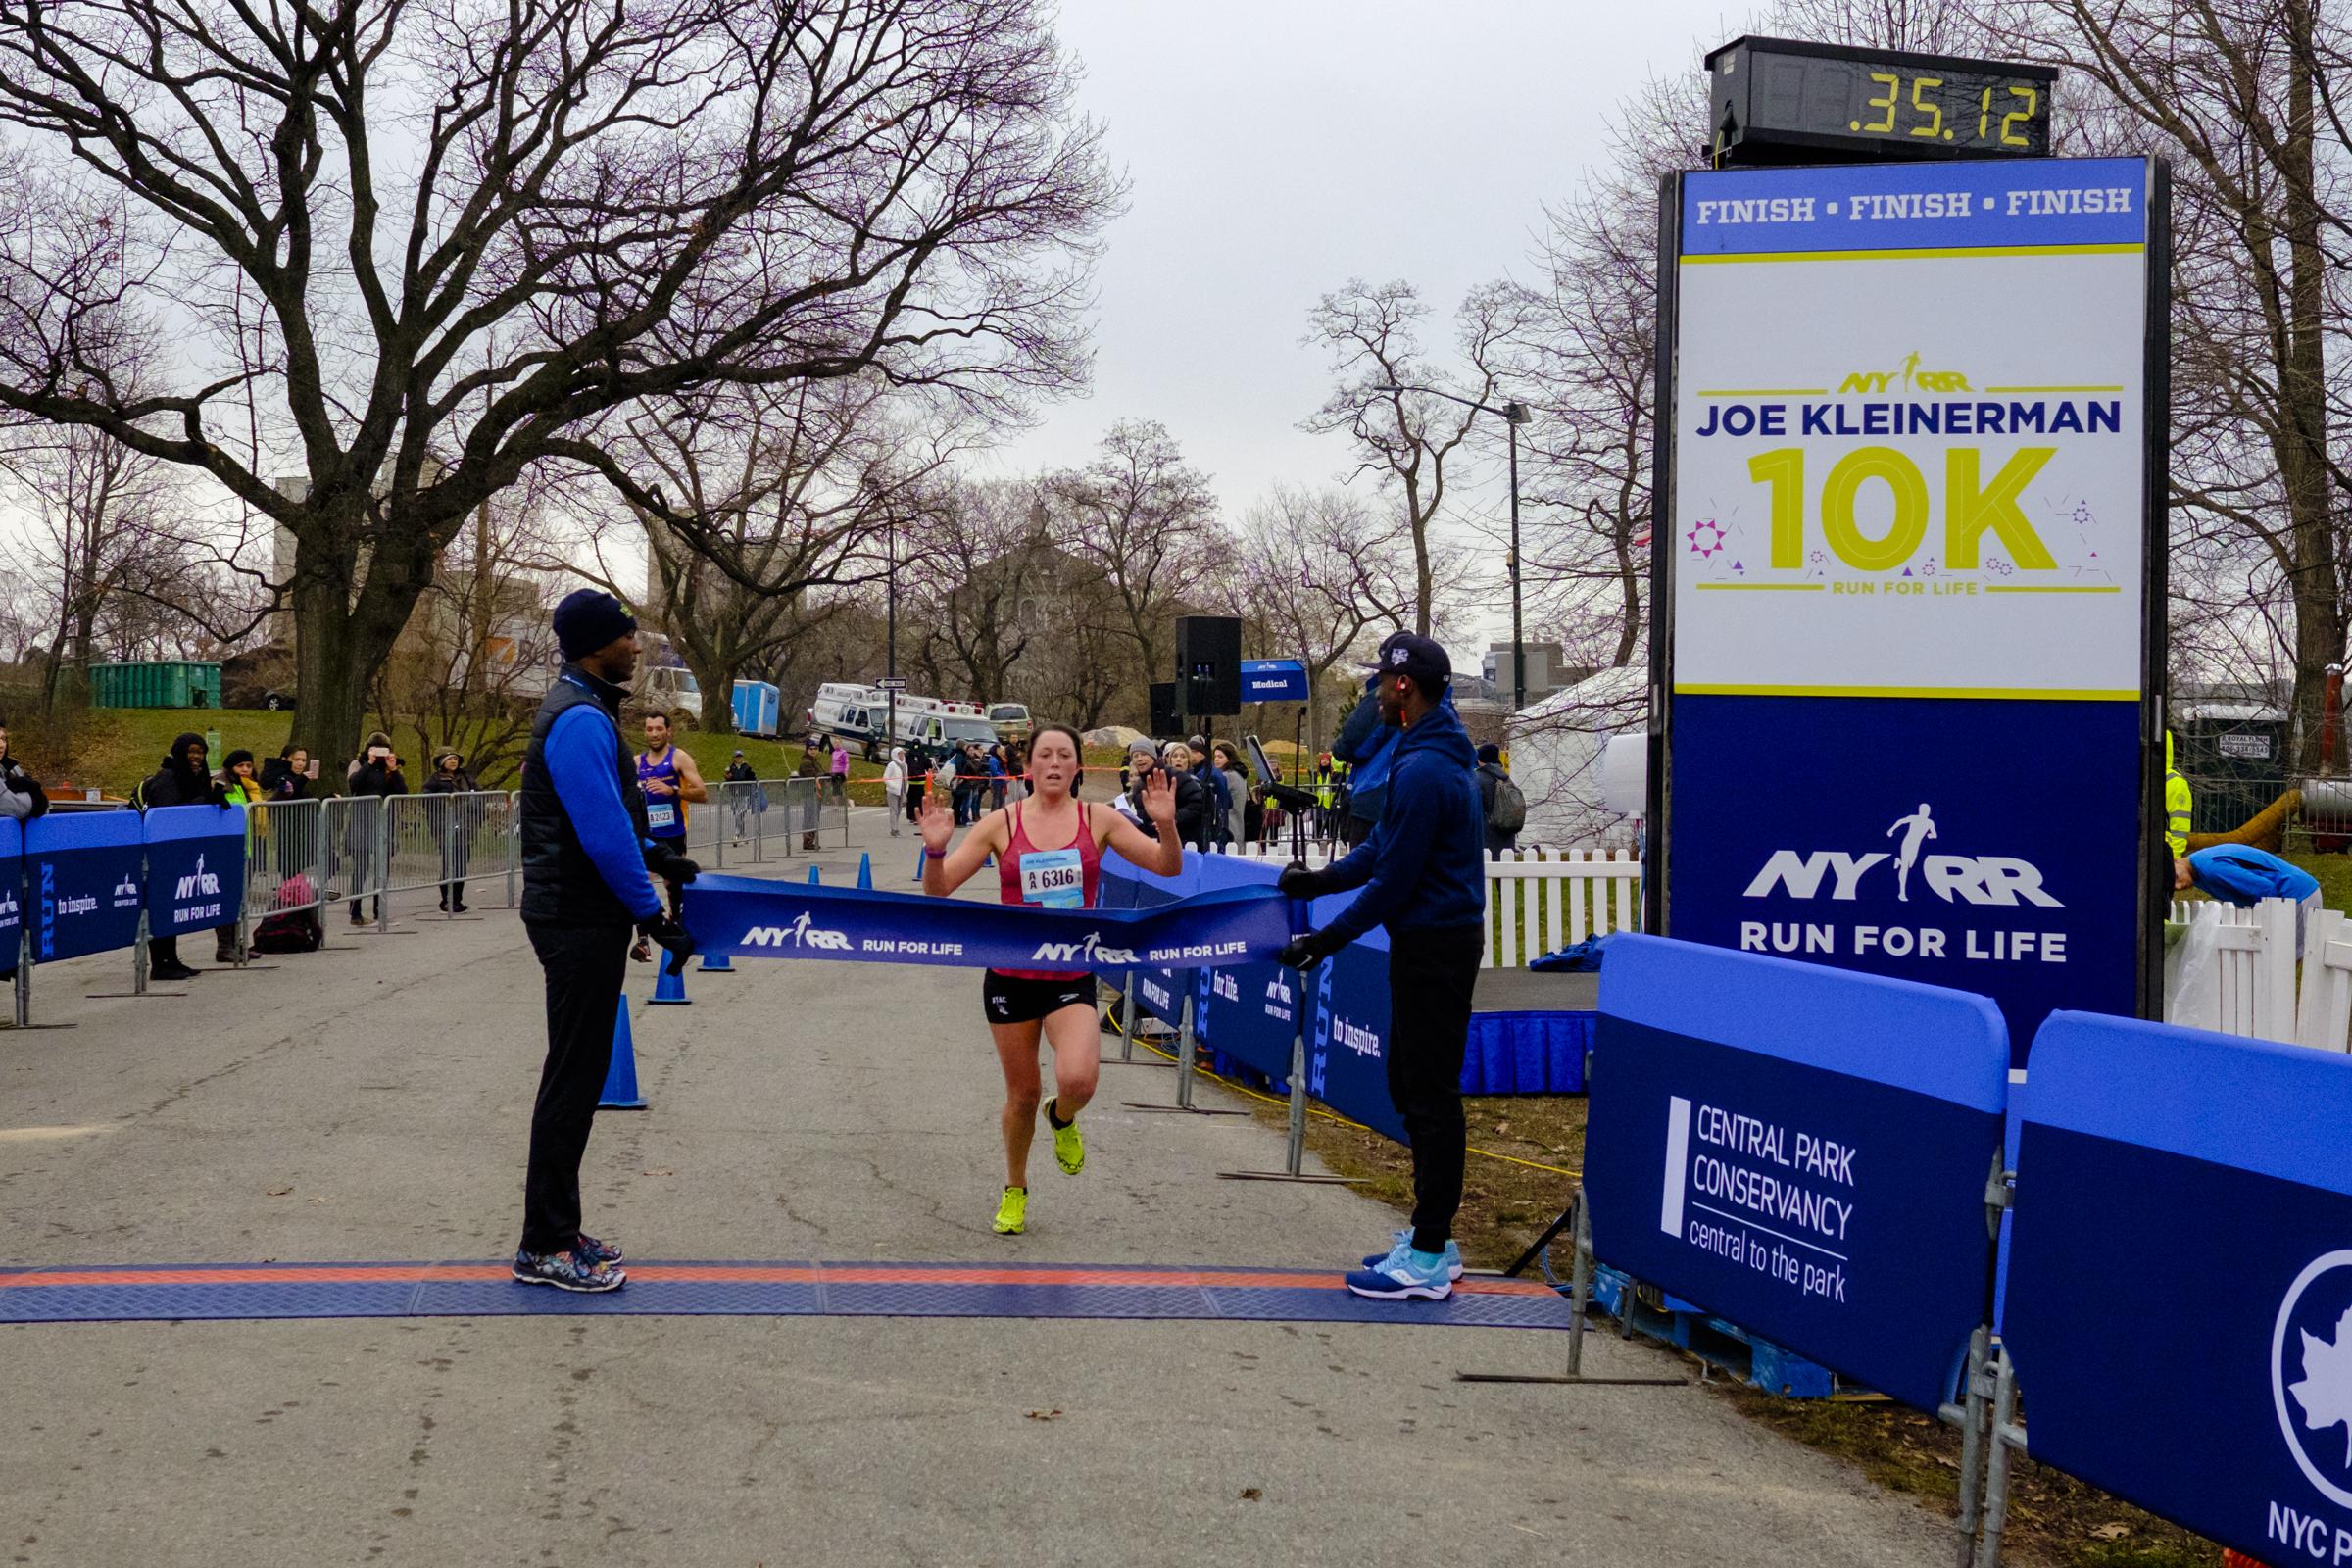 Kieffer breaking the finish-line tape at the 2015 NYRR Joe Kleinerman 10K.